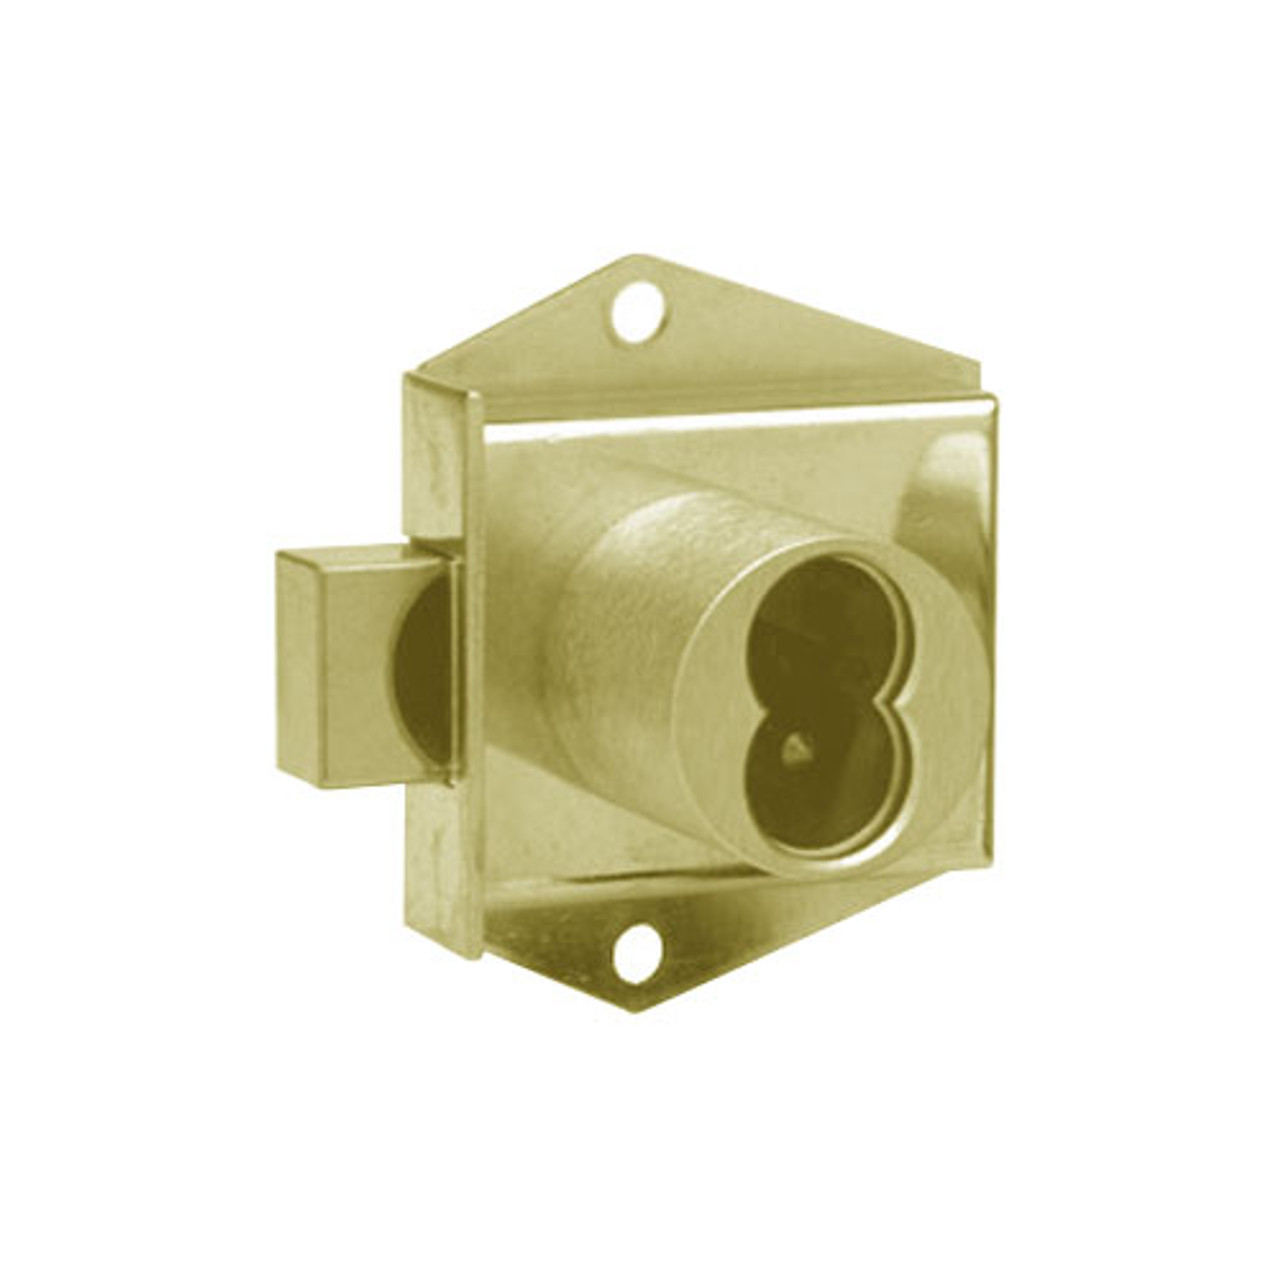 Olympus 725MD-DW-VH-US4 Cabinet Locks in Satin Brass Finish